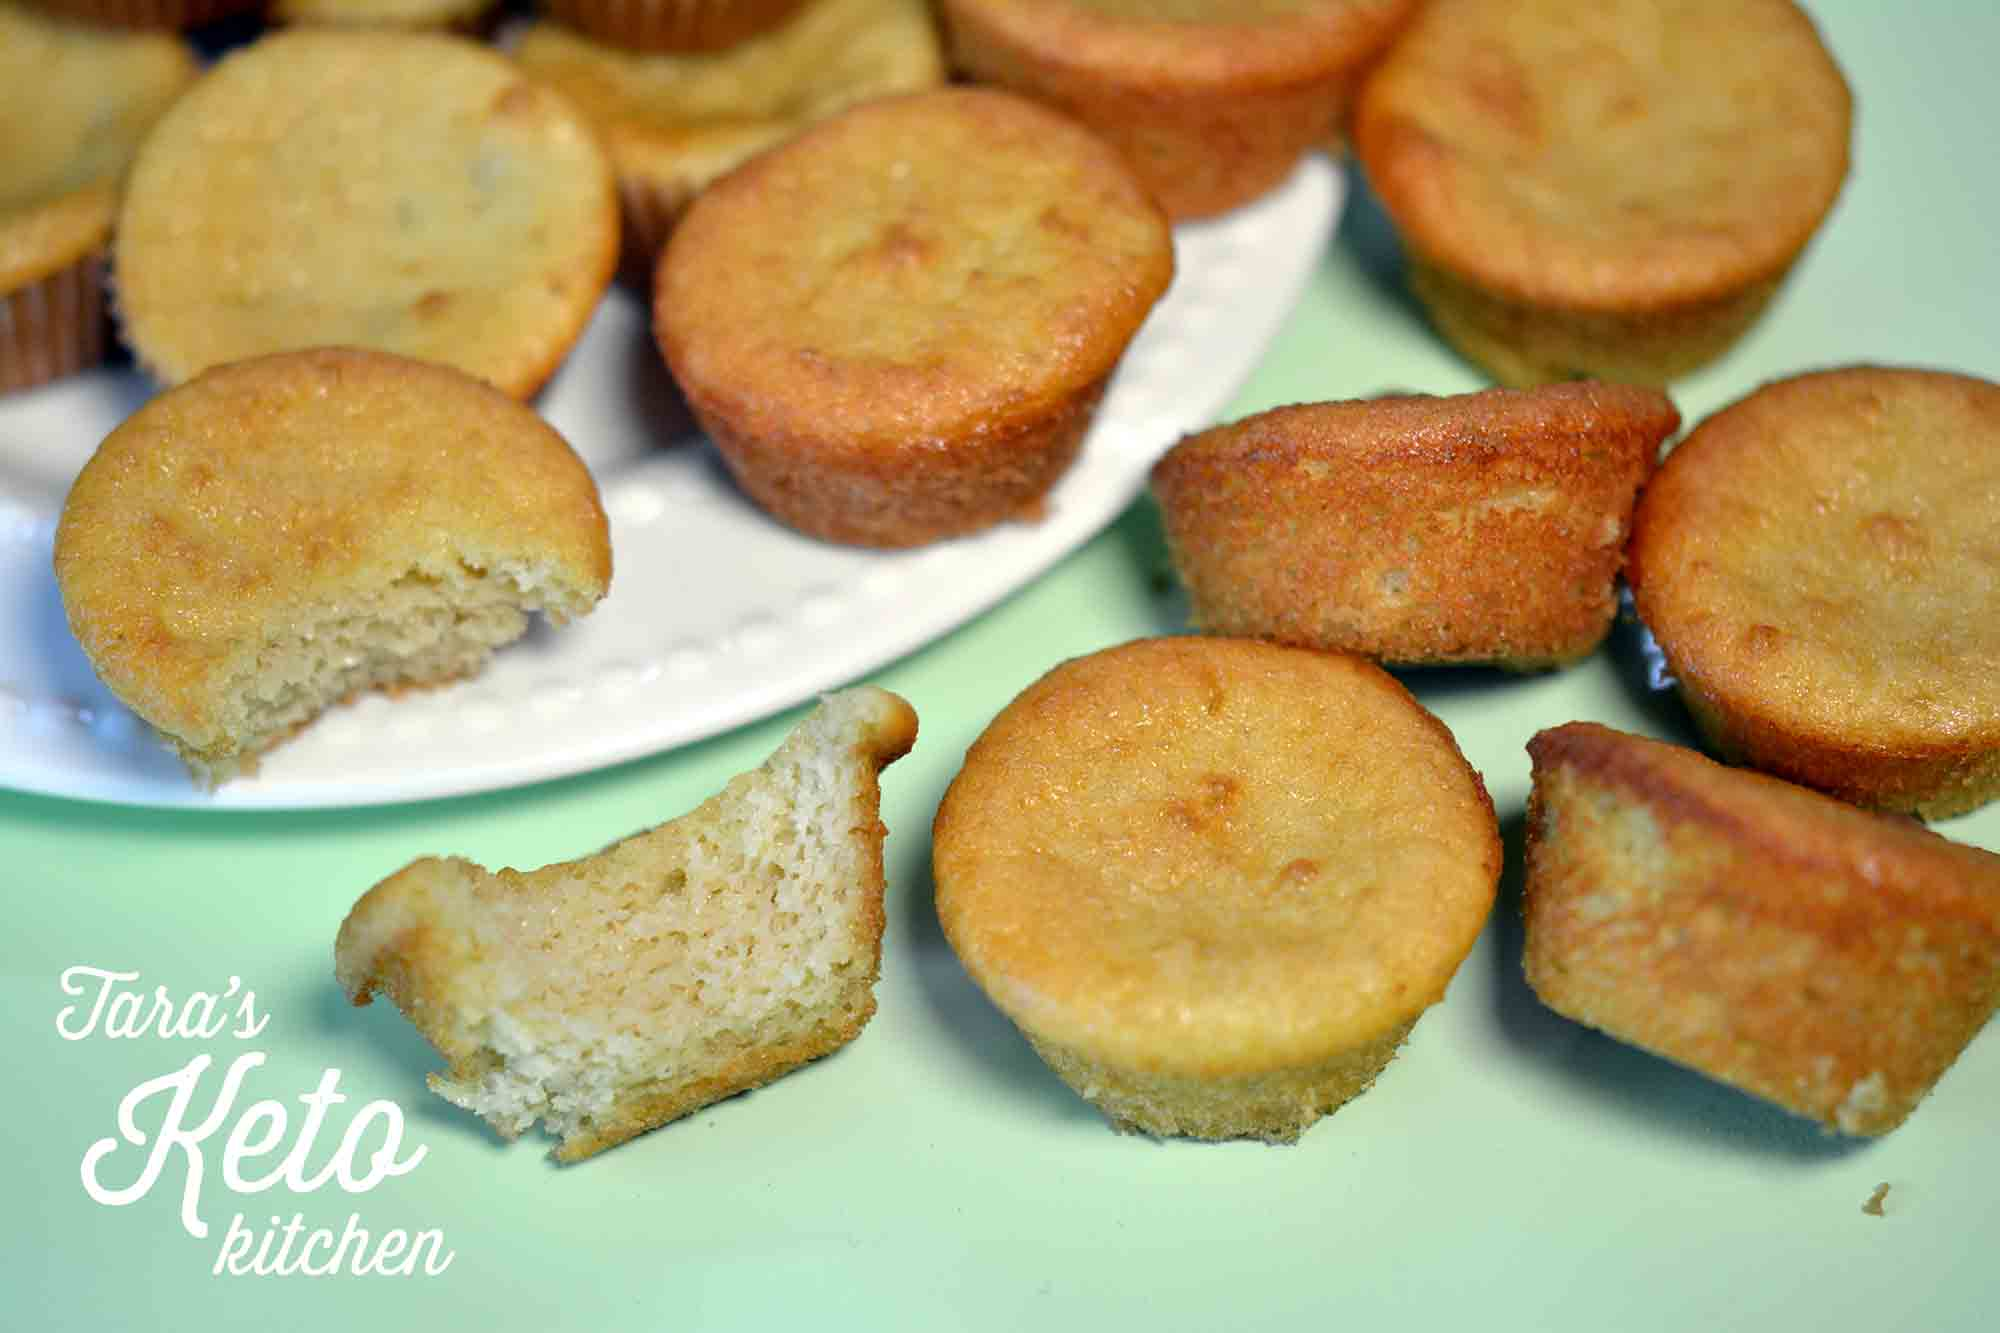 keto muffins 2